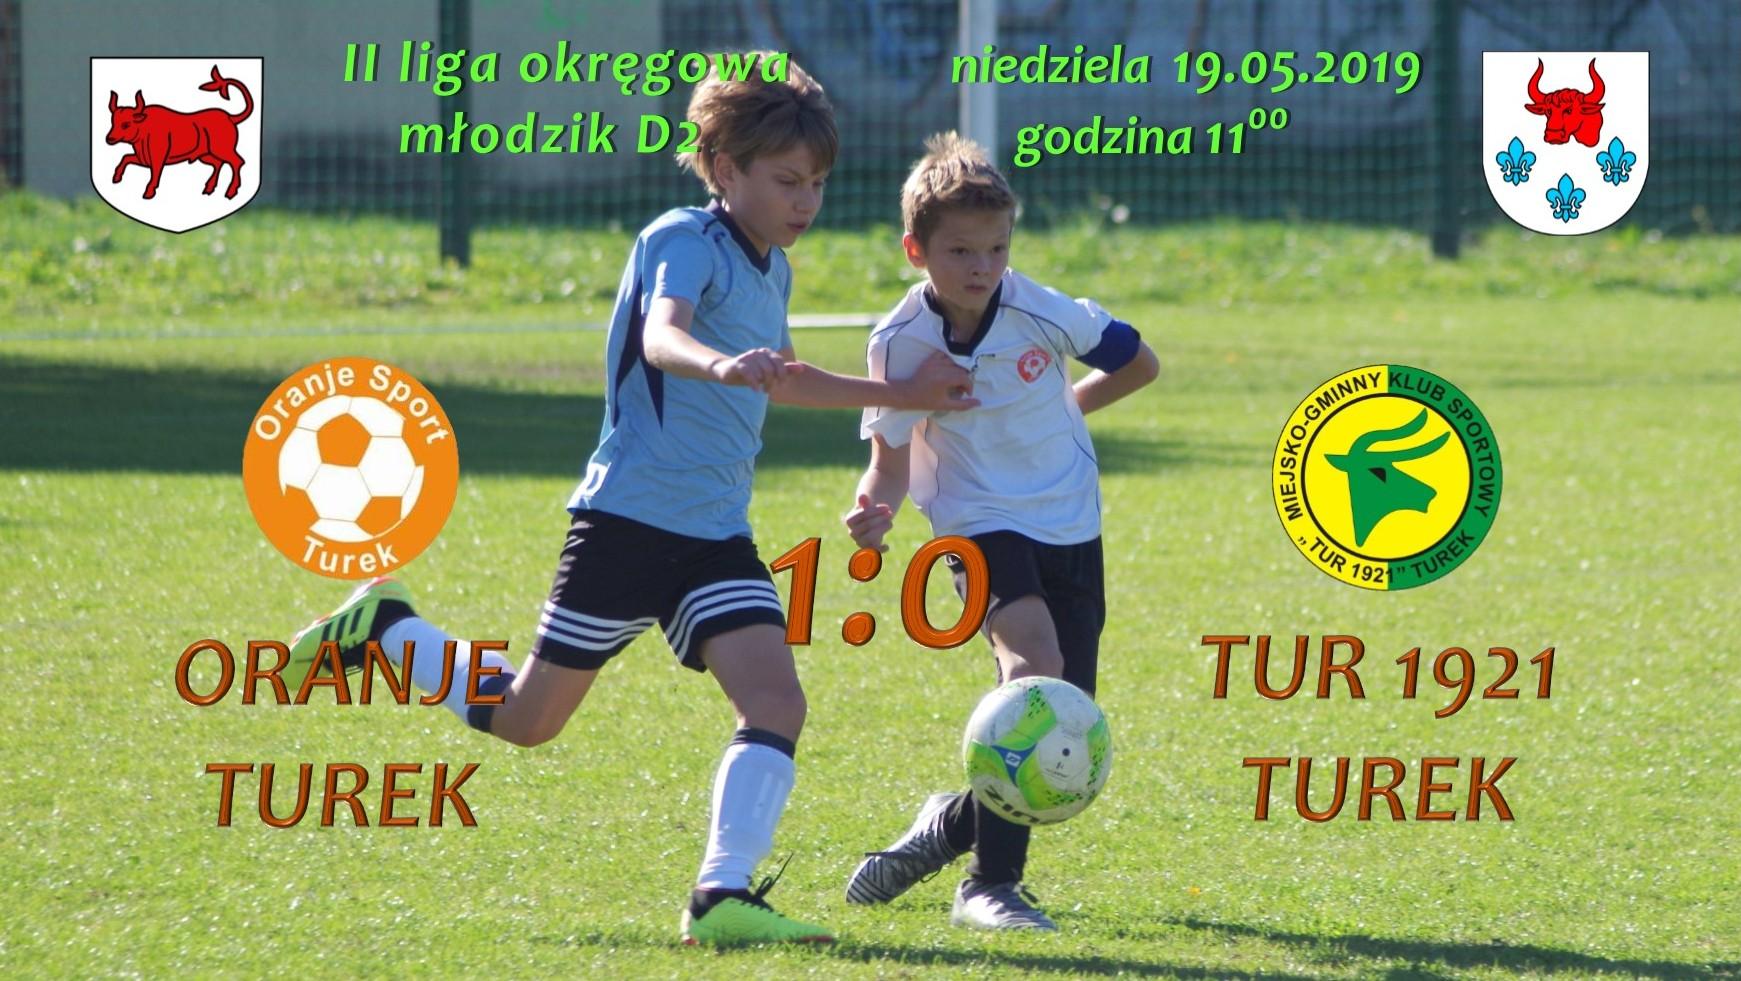 Oranje Turek- Tur 1921 Turek 1:0, młodzik D2